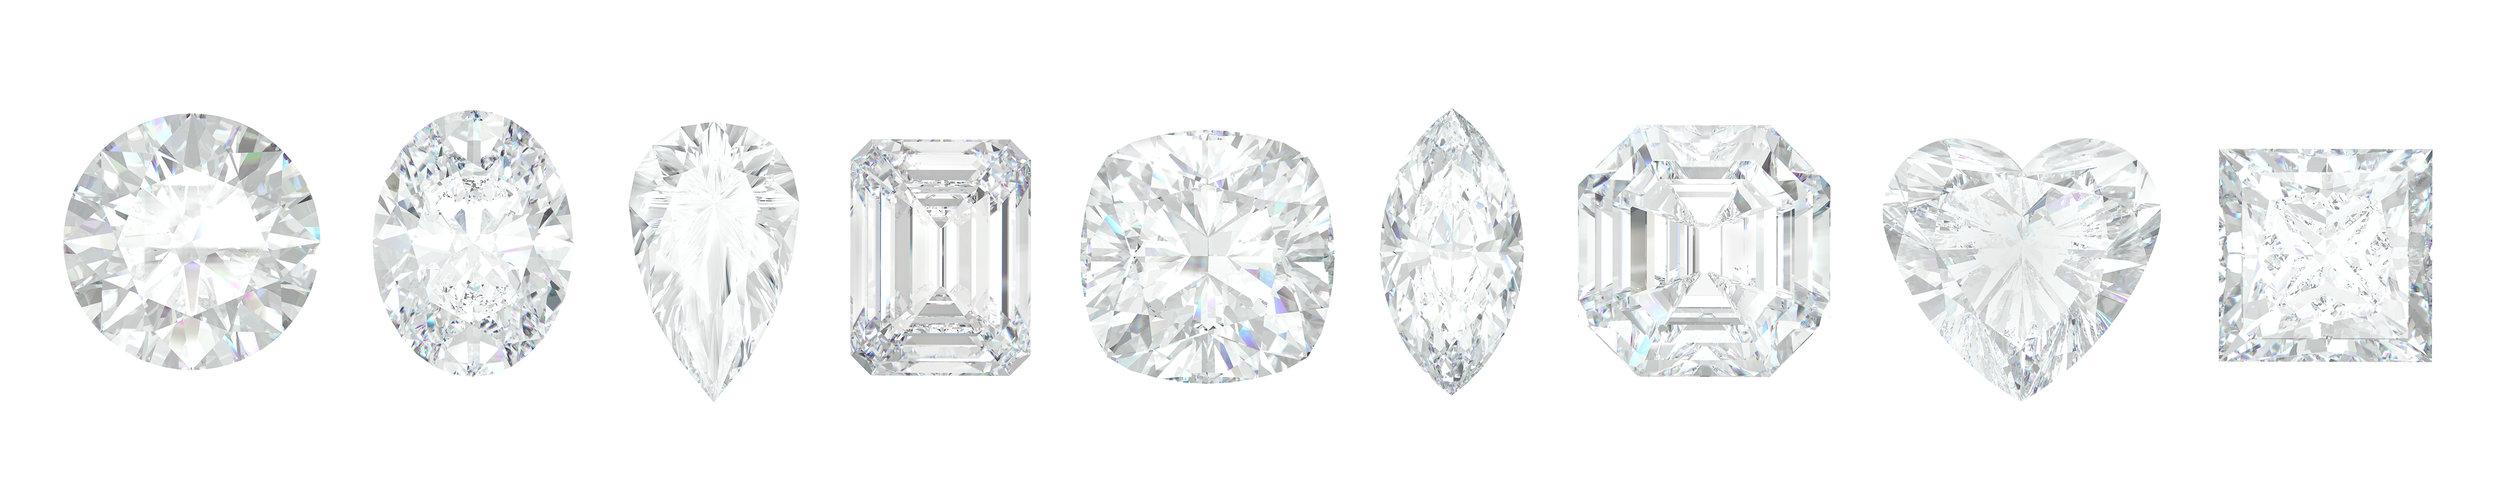 Different diamond shapes